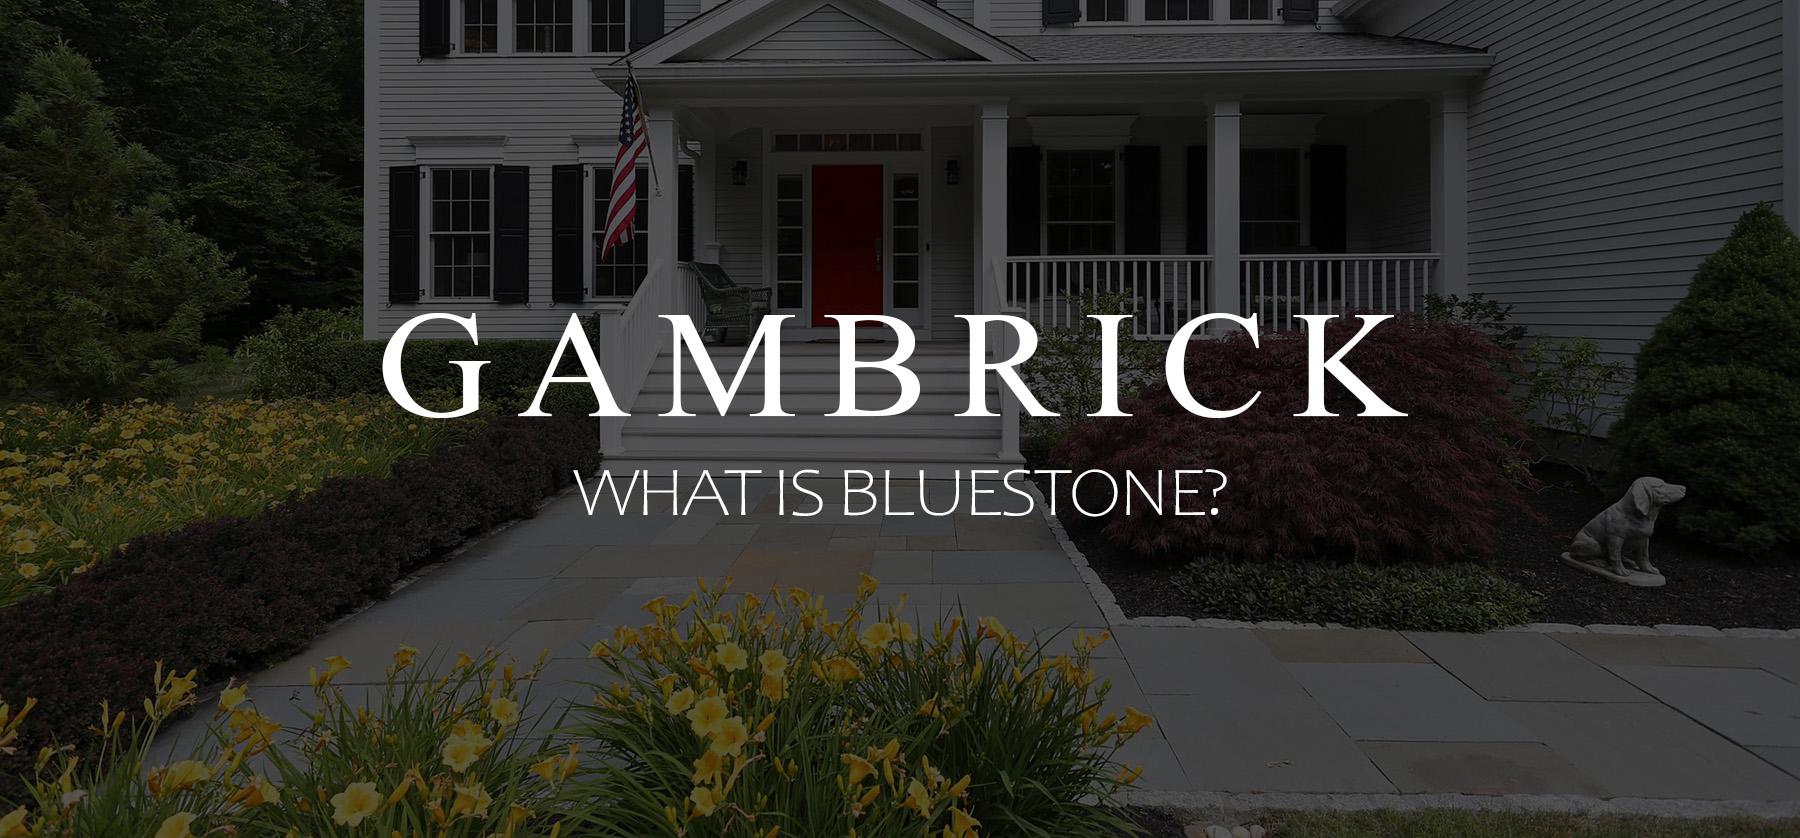 What is bluestone? banner 1